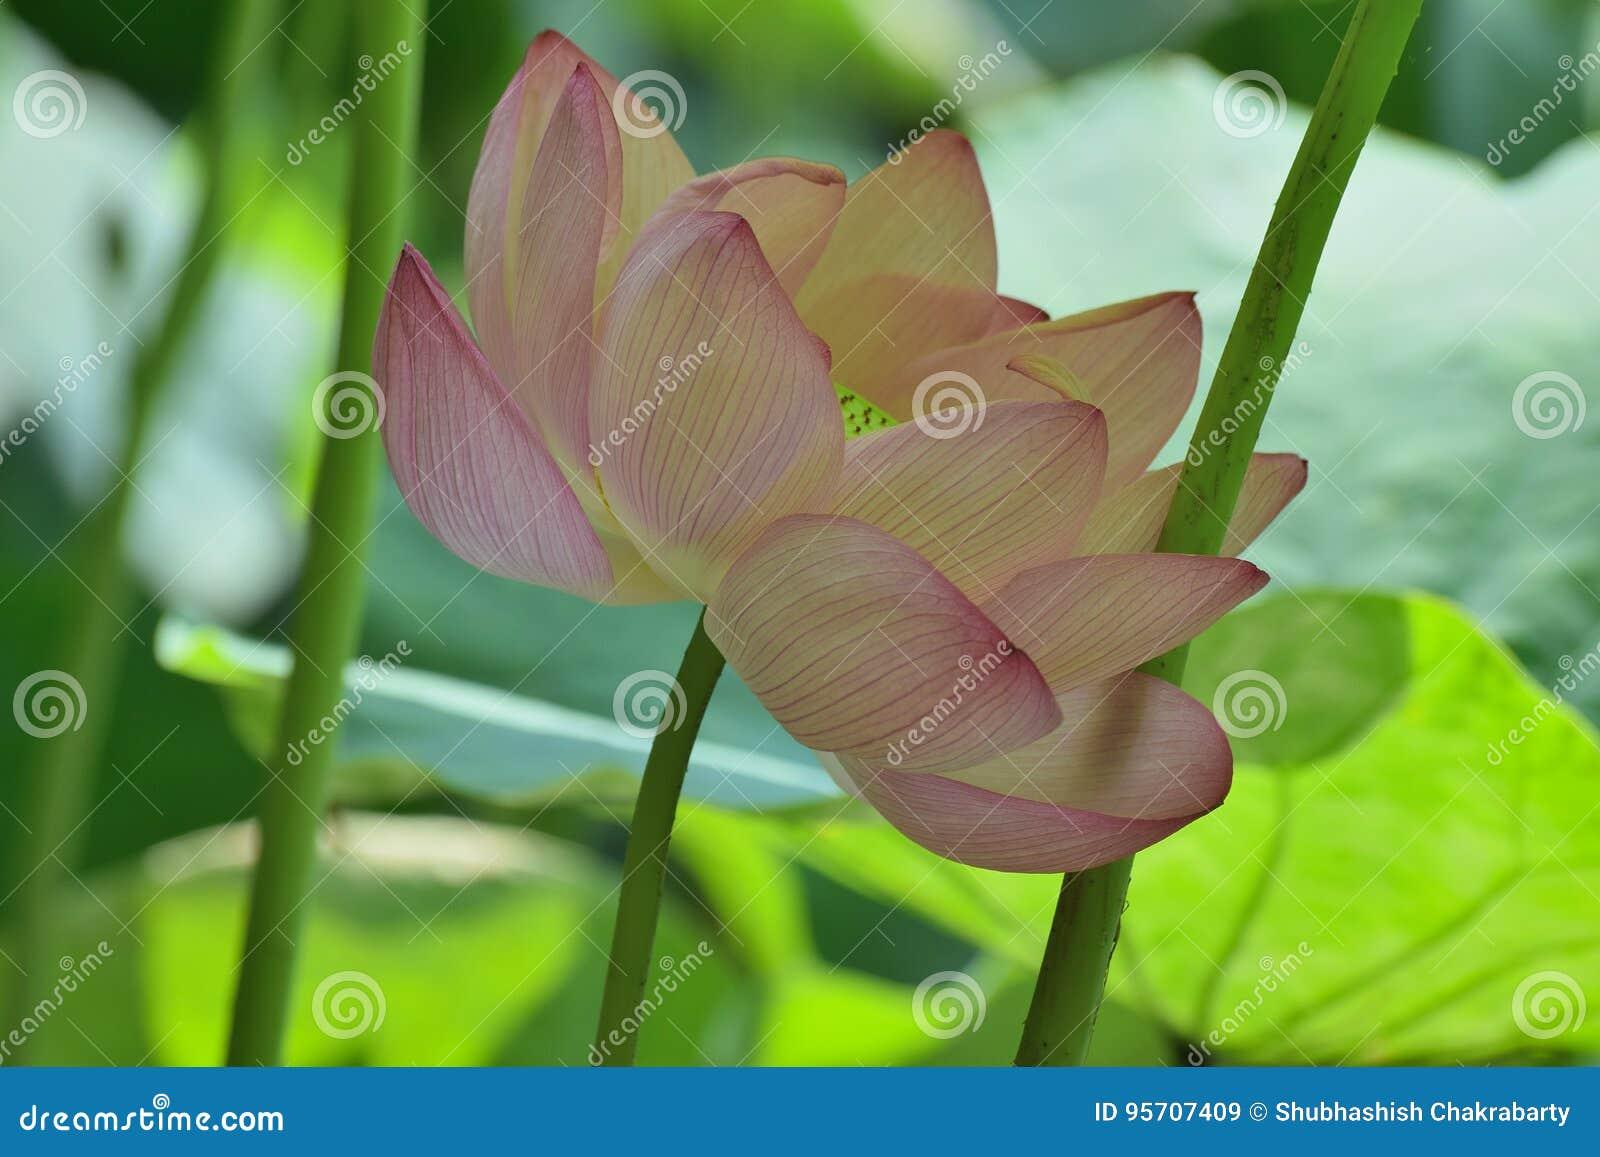 Macro Details Of Japanese Pink Lotus Flower In Horizontal Frame